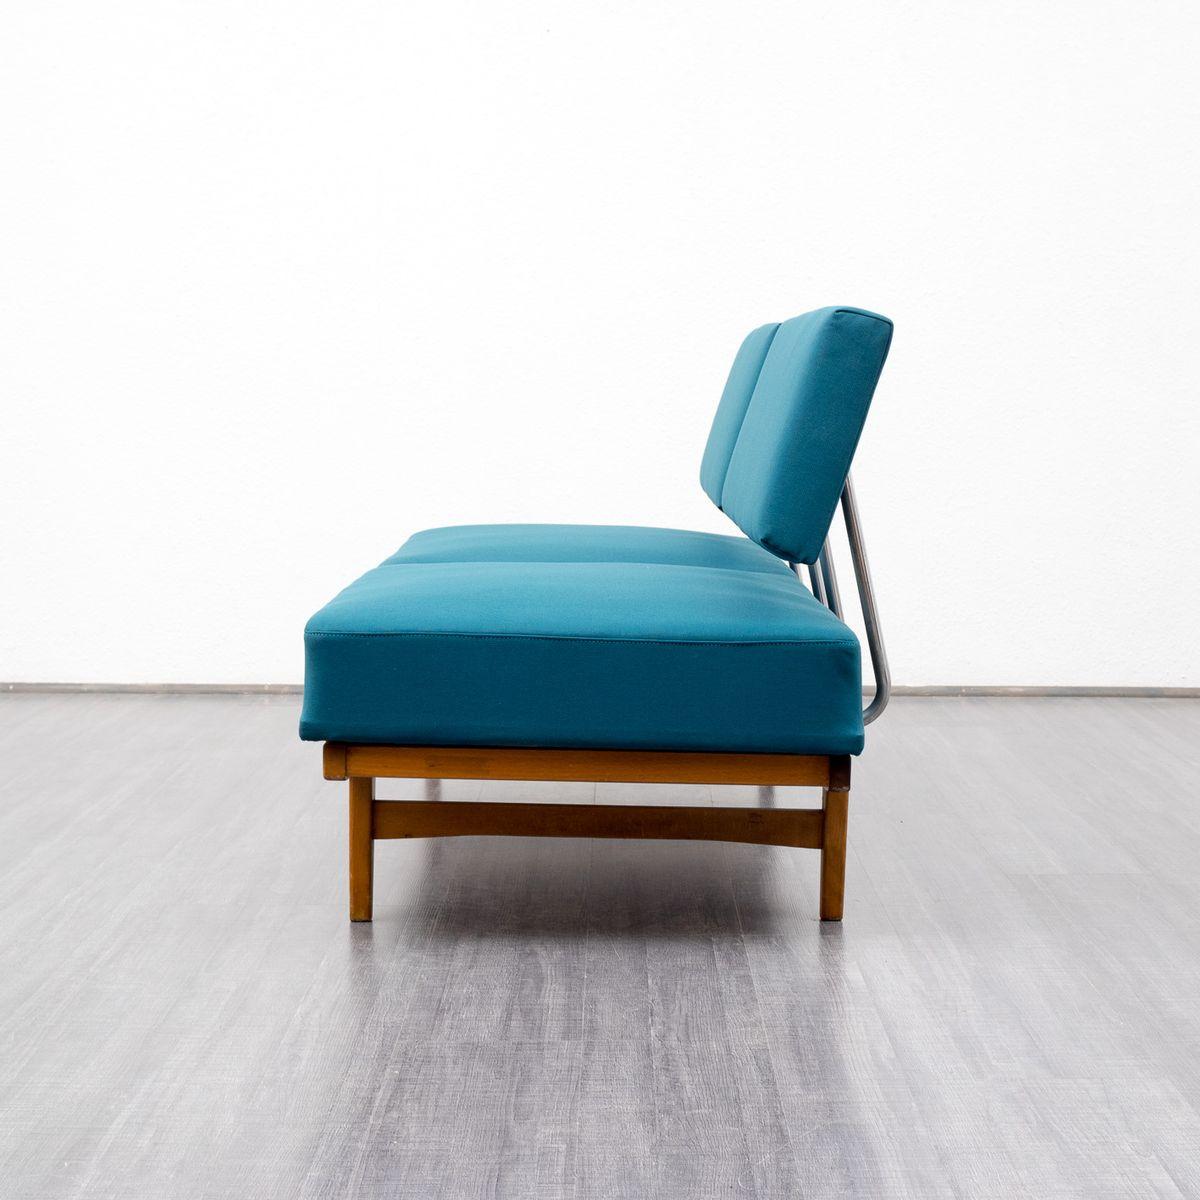 petrol blaue mid century liege bei pamono kaufen. Black Bedroom Furniture Sets. Home Design Ideas